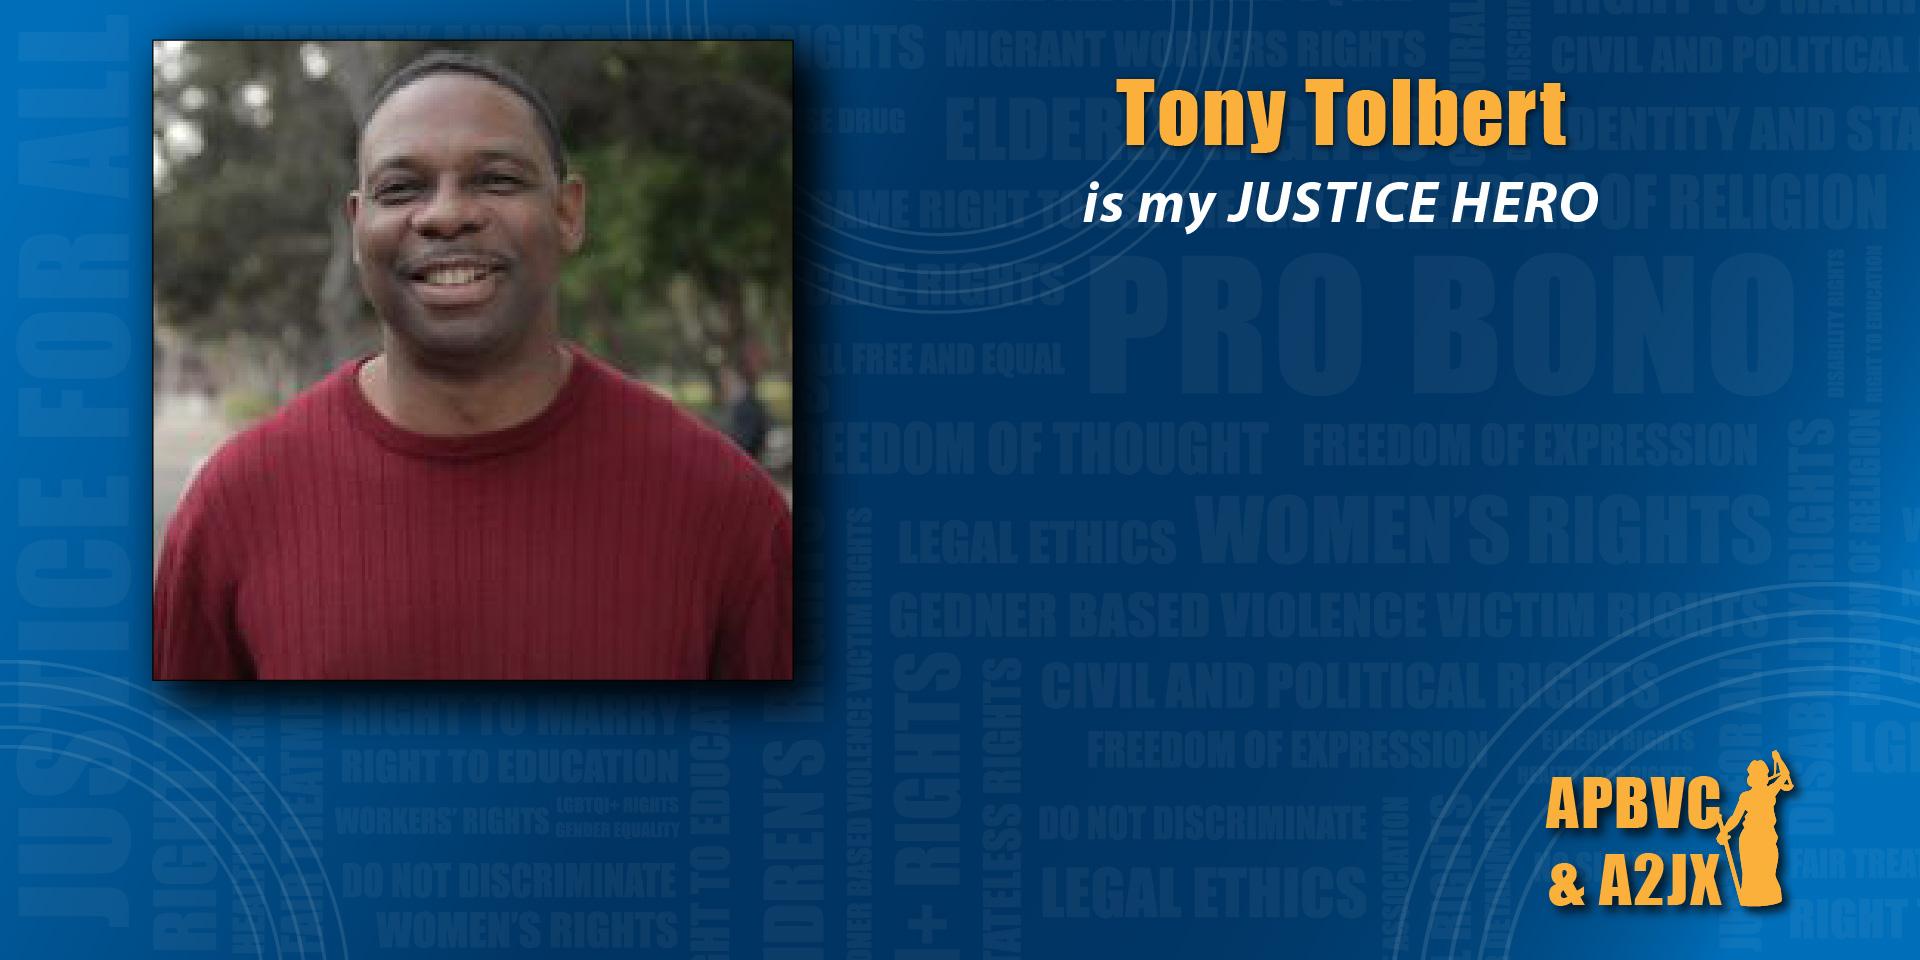 Tony Tolbert